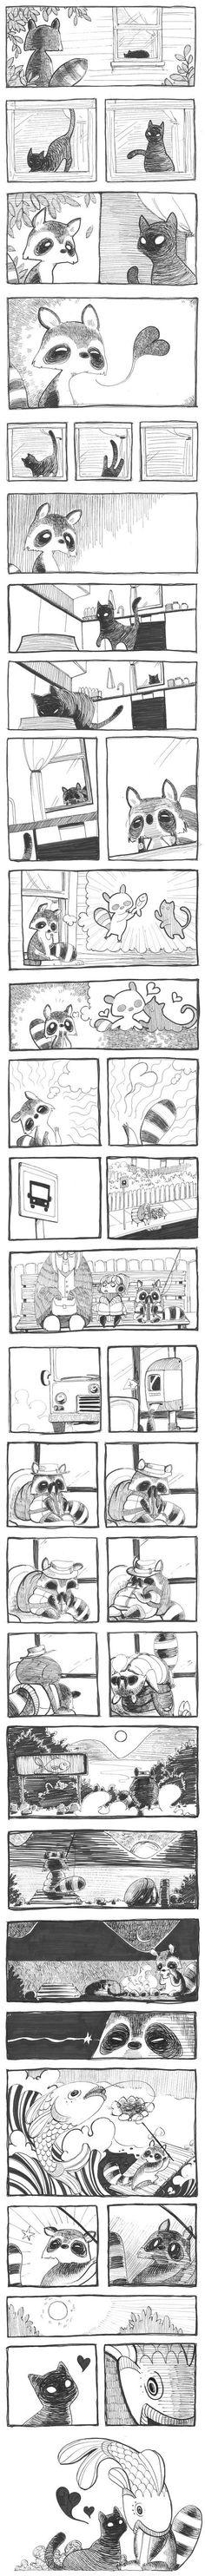 29 ideas cats humor cartoon comic for 2019 Comic Manga, Comic Art, Cute Stories, Short Stories, Rage Comic, Funny Animals, Cute Animals, Mini Comic, Comics Story